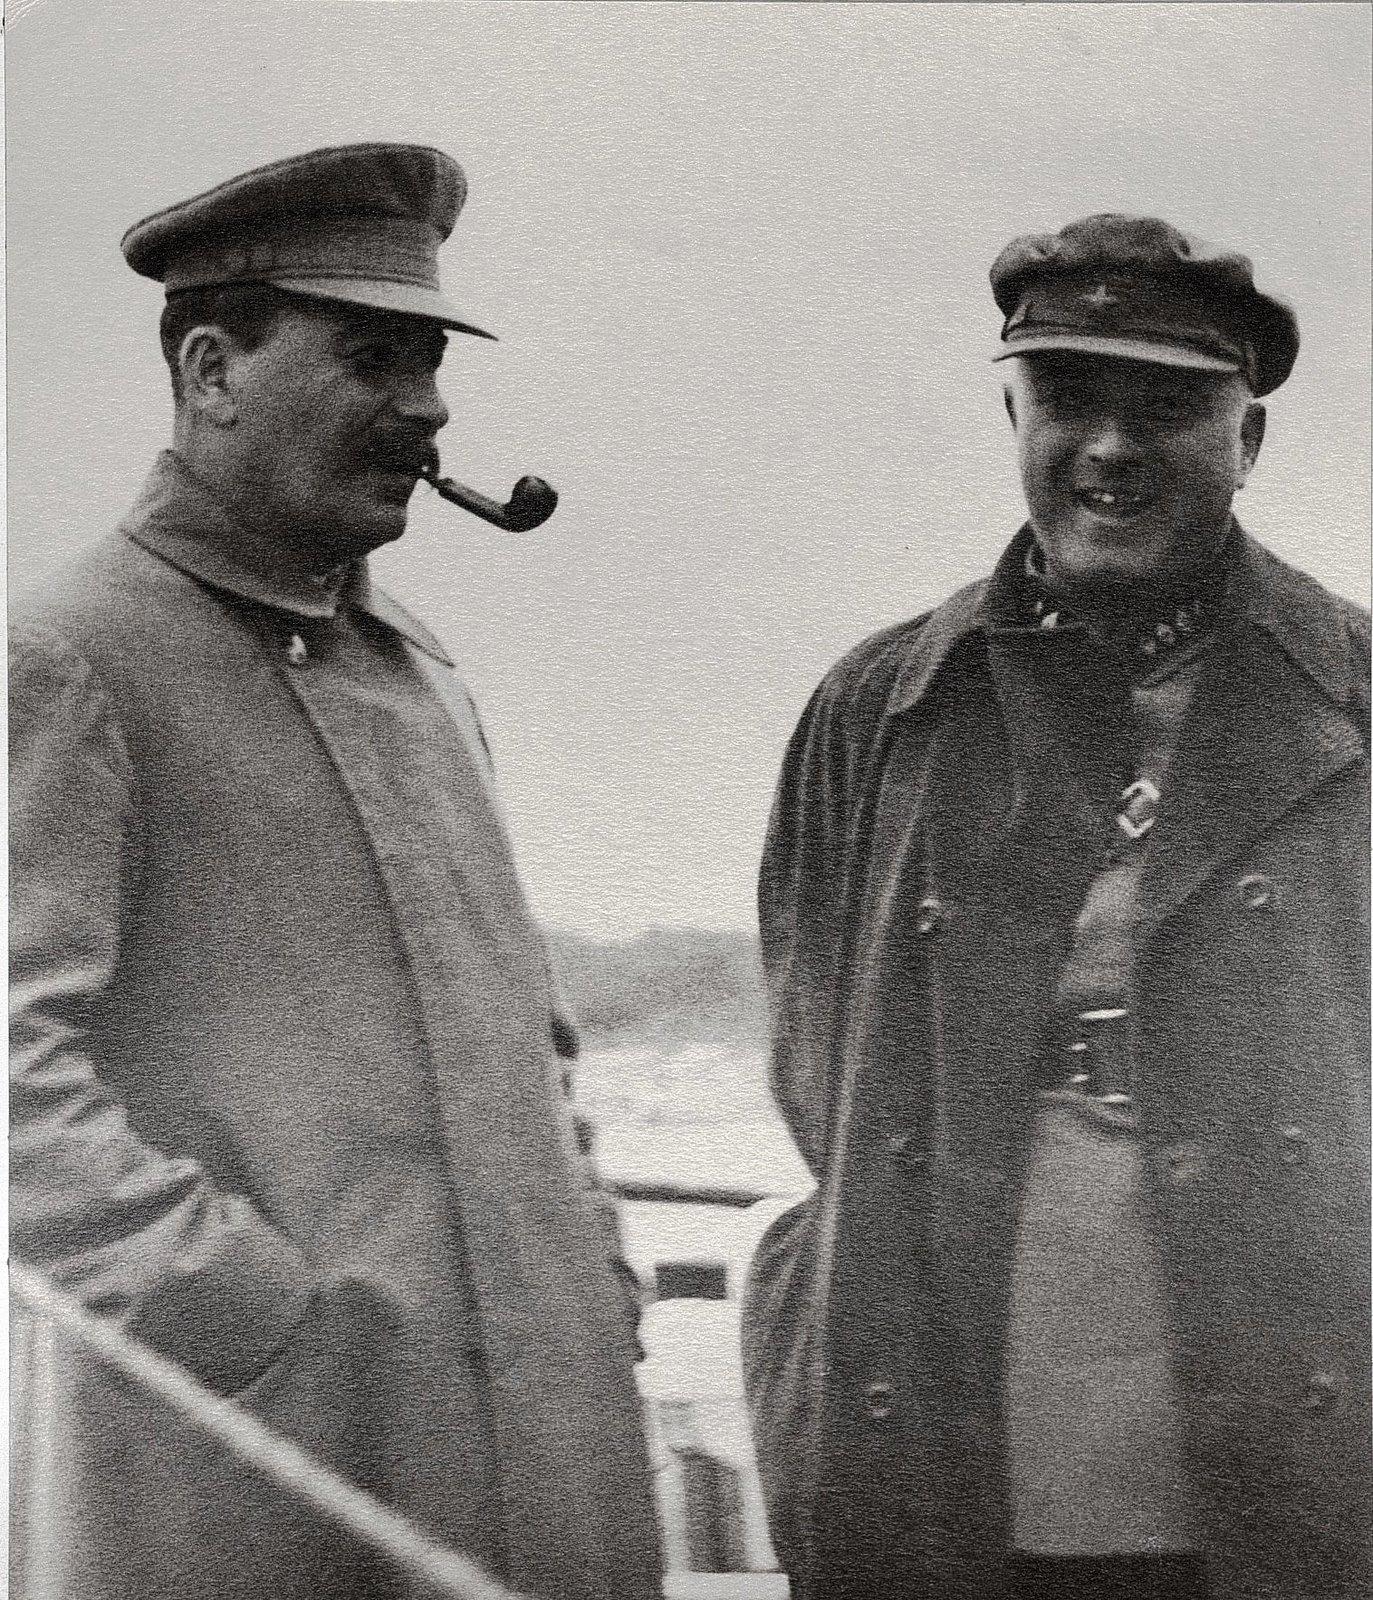 30. И.В. Сталин и Н.С. Власик. Теплоход Клара Цеткин. Август 1933